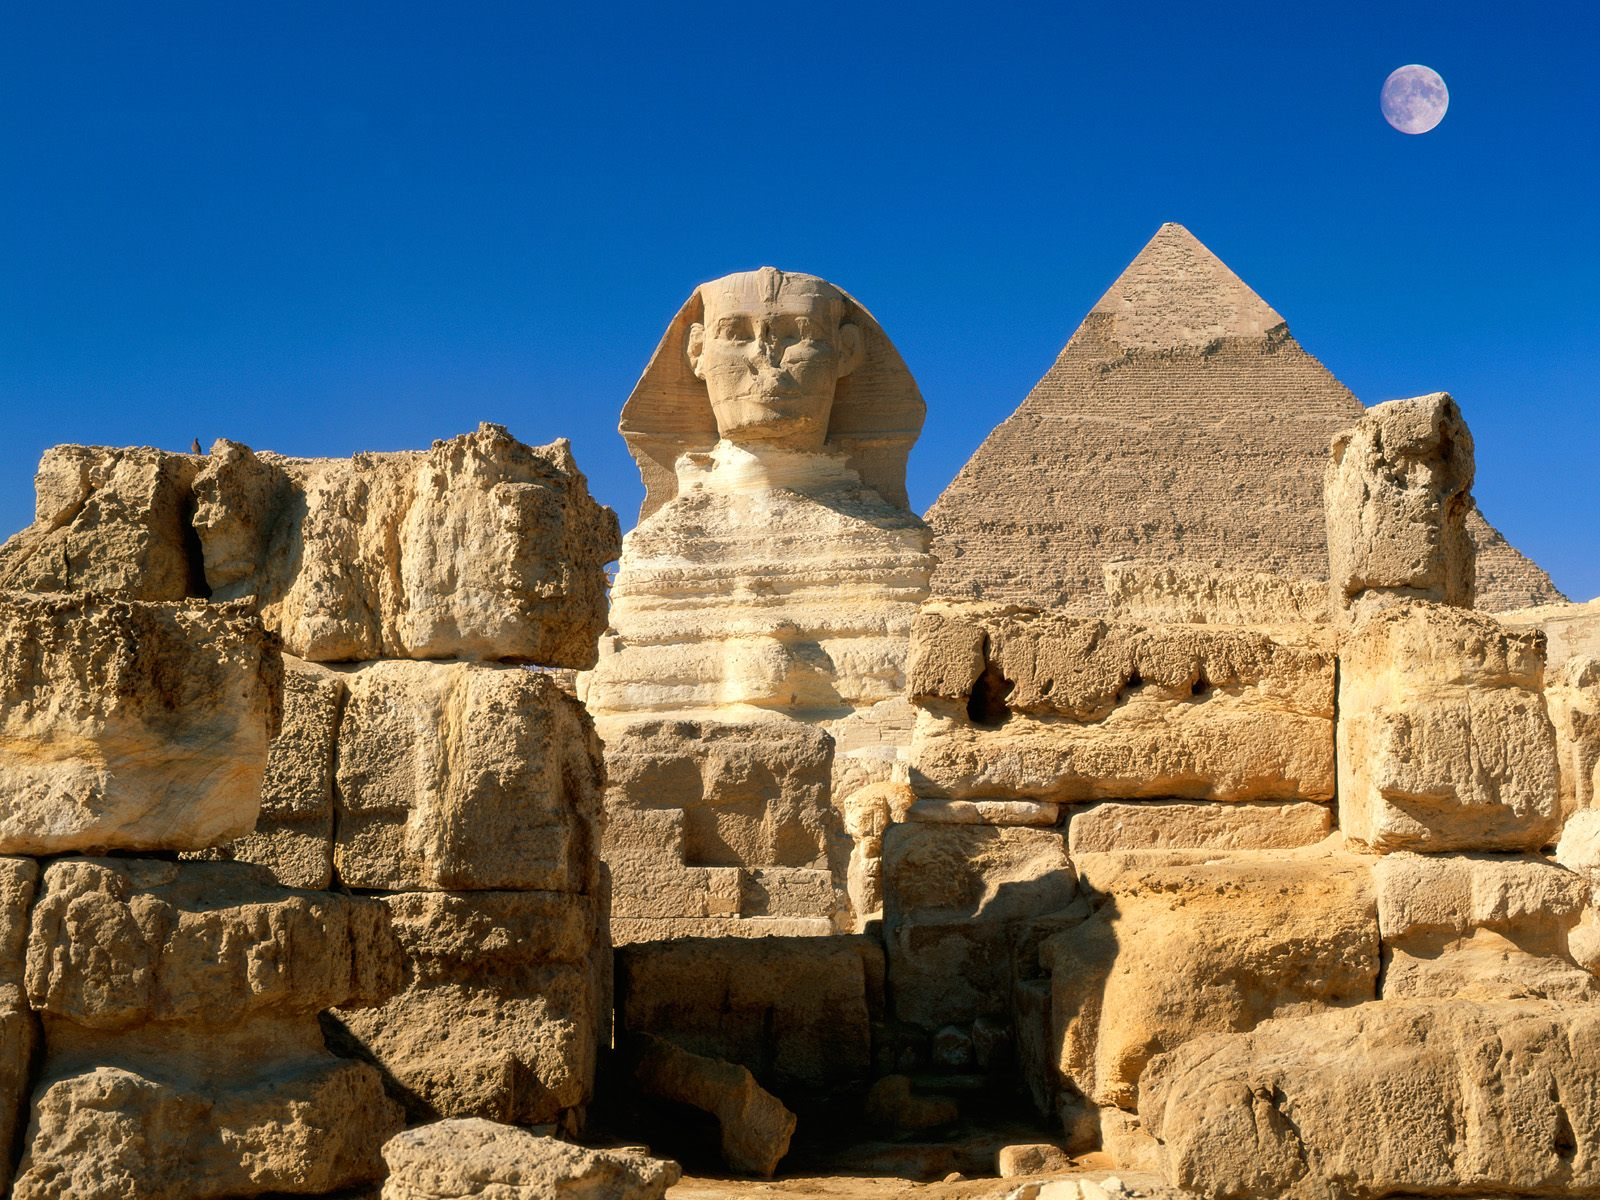 http://4.bp.blogspot.com/-G1NeNlQL-9s/TnE_uV_dHxI/AAAAAAAAOu4/3s1iT1W283k/s1600/Great+Sphinx%252C+Chephren+Pyramid%252C+Giza%252C+Egypt.jpg